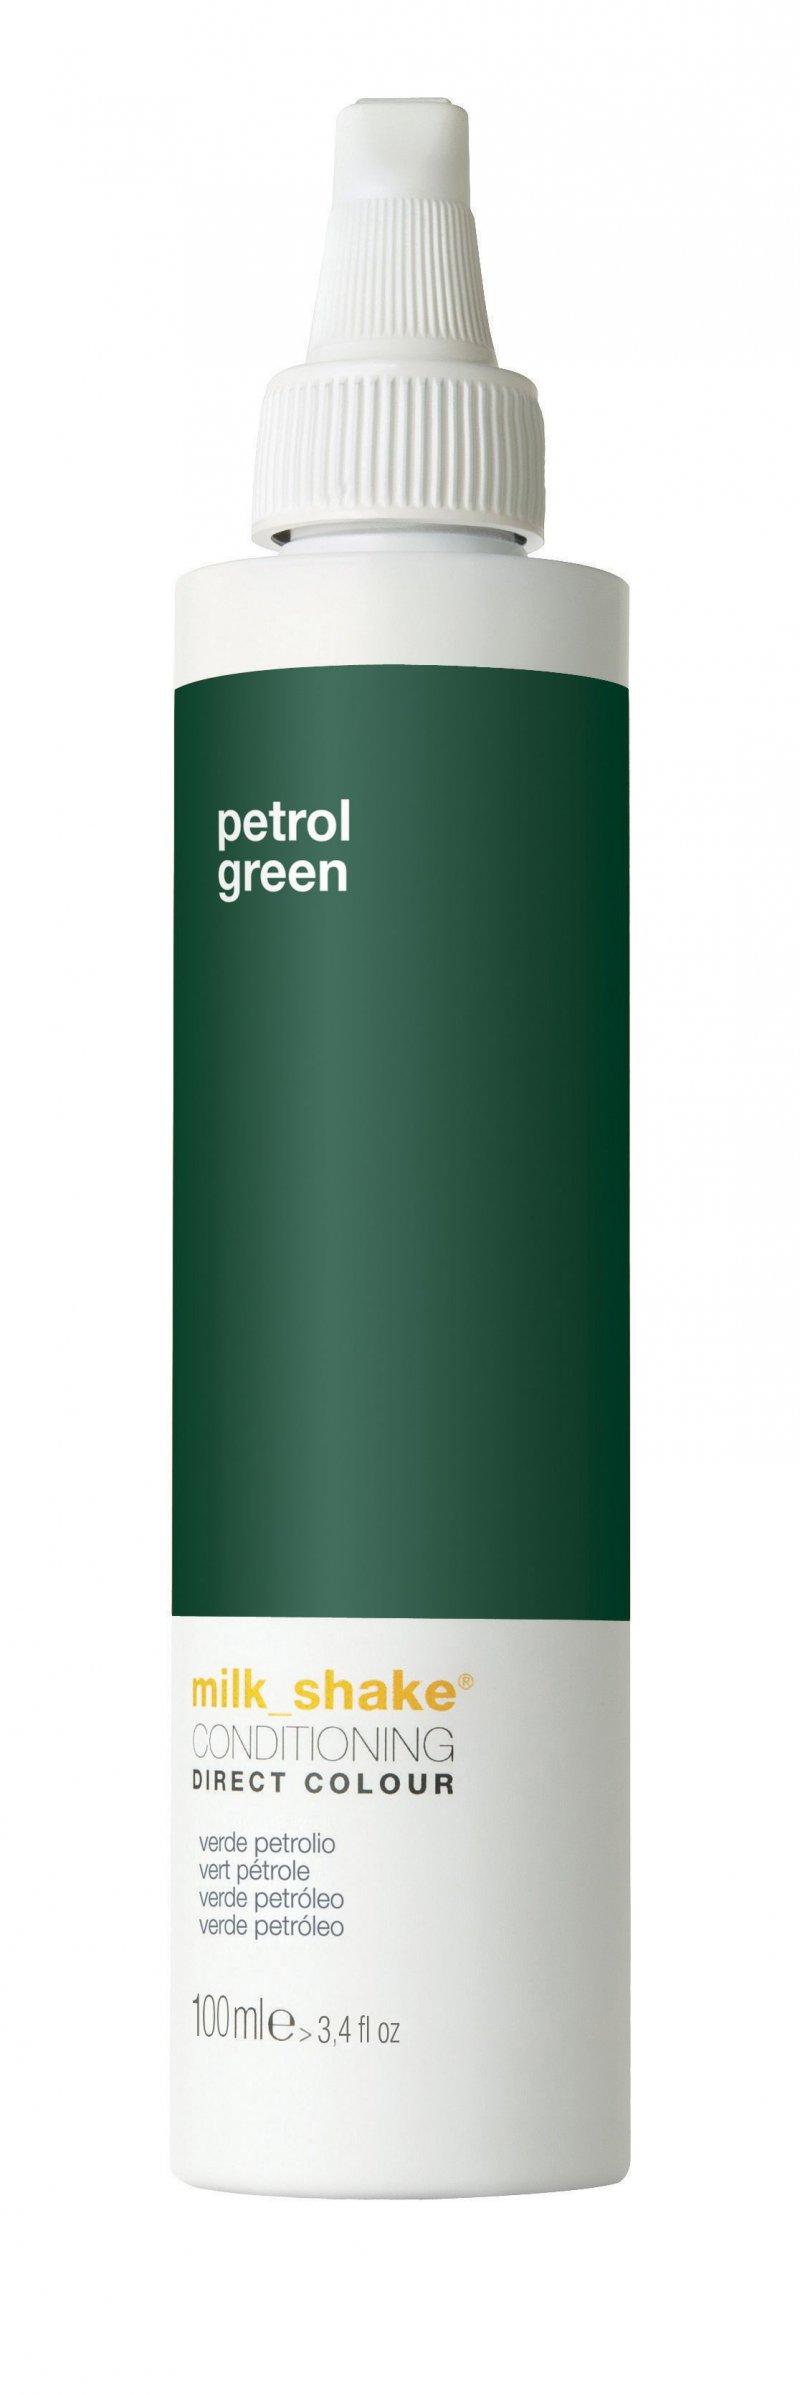 Milk_shake - Direct Color 100 Ml - Petrol Green